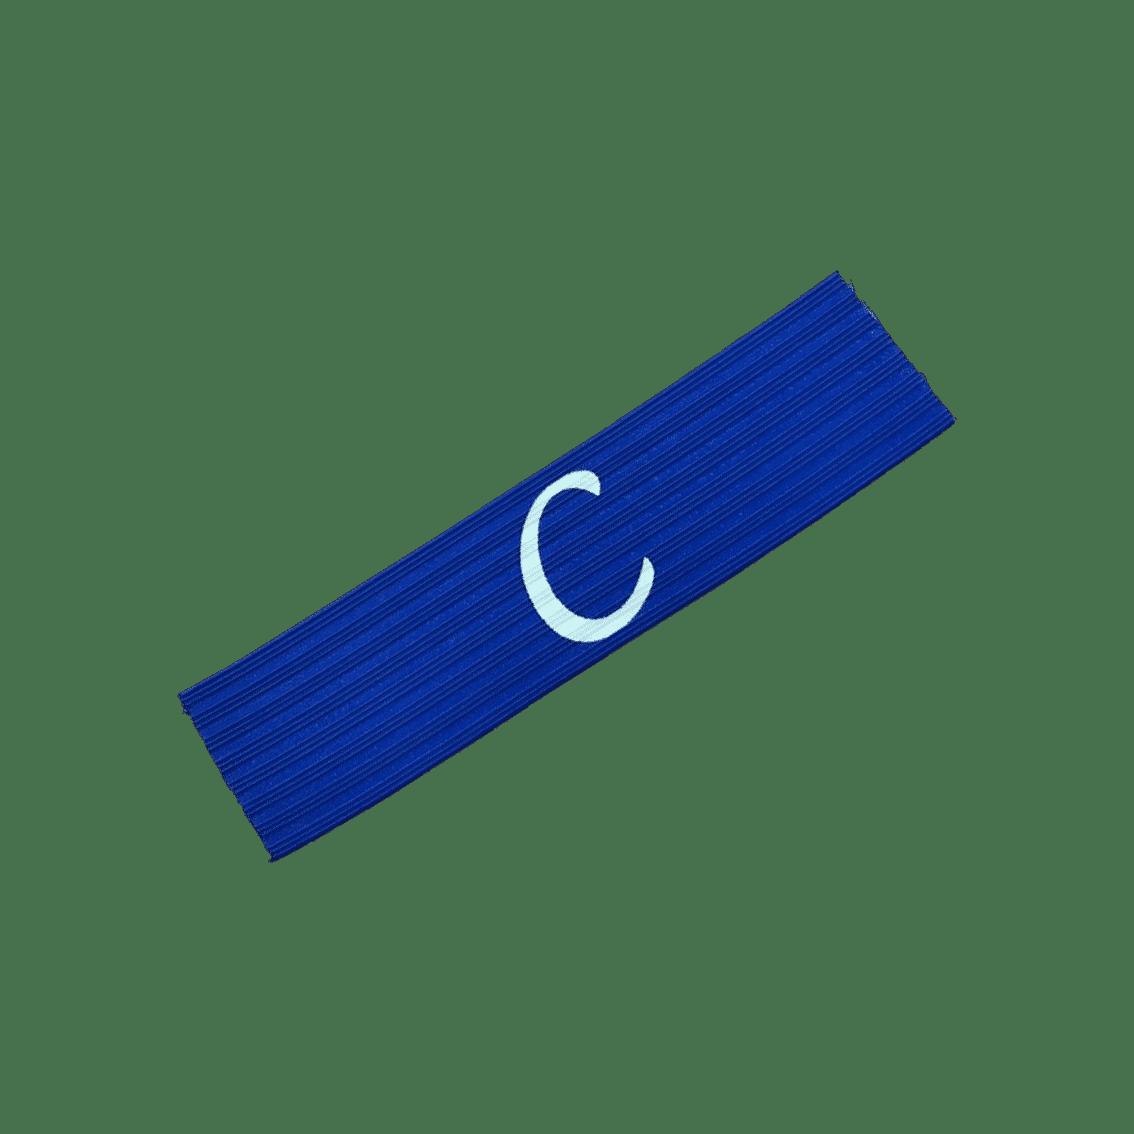 Standaard-blauw.png